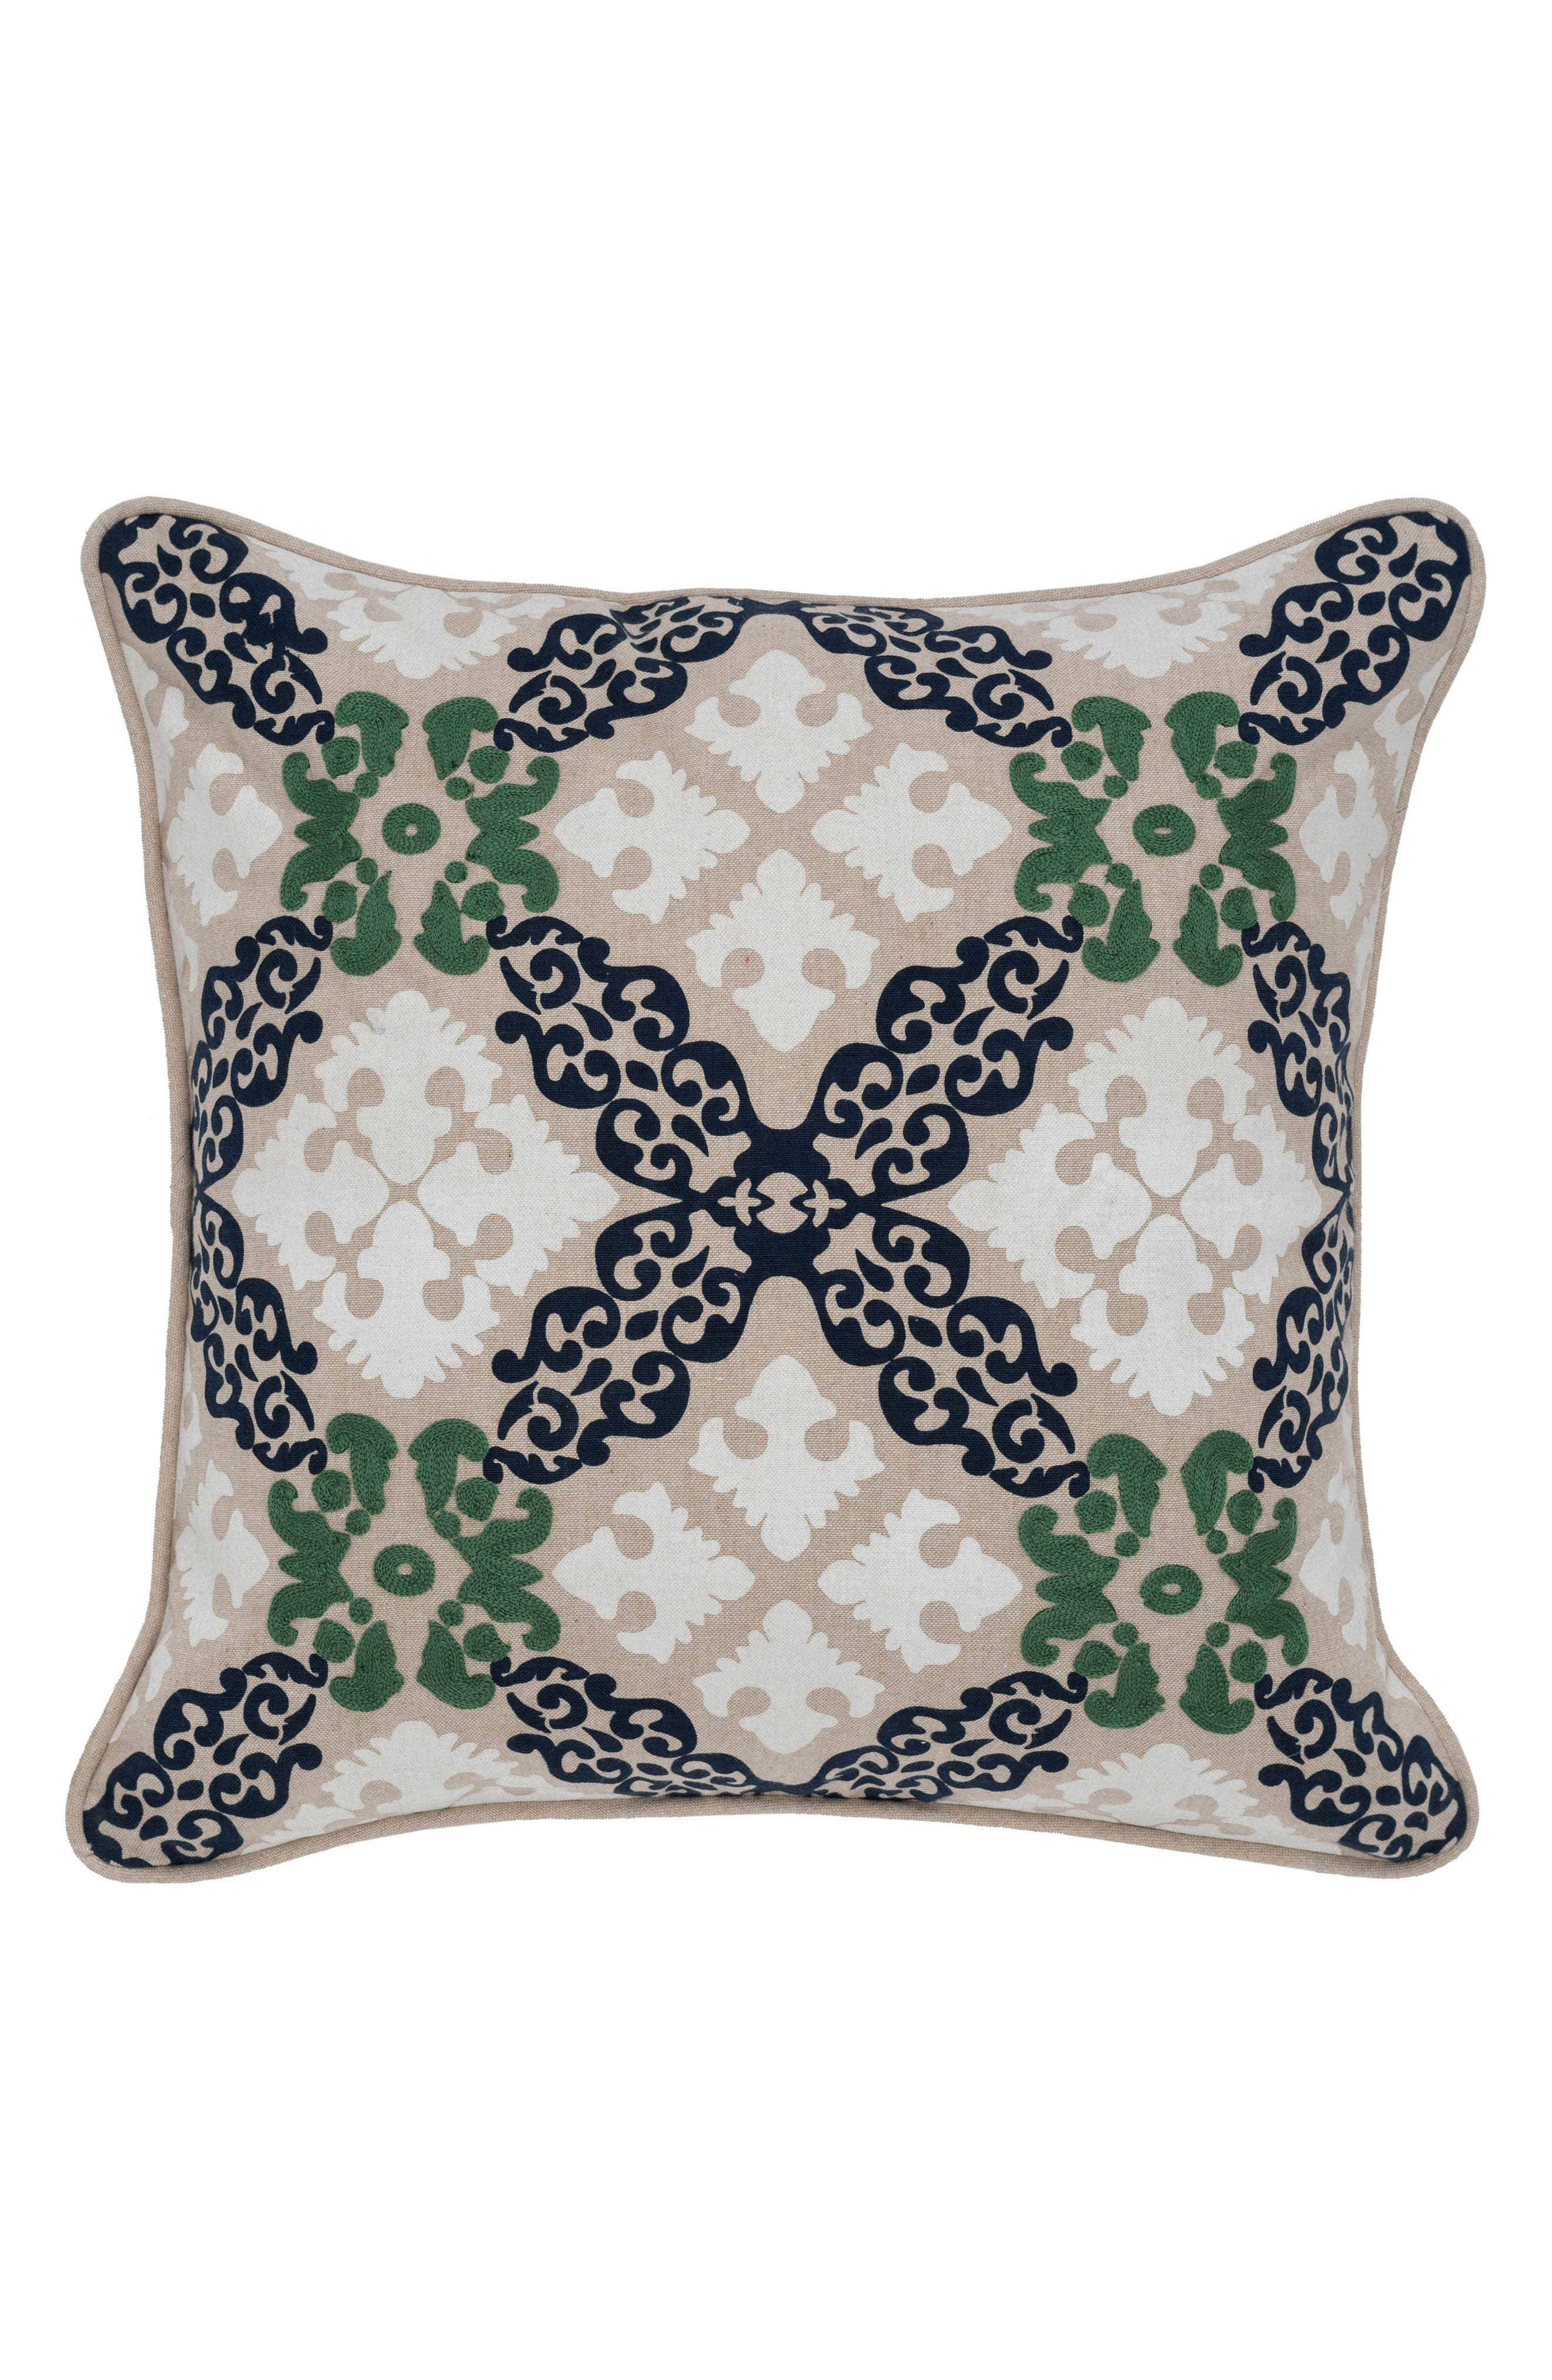 Ve Dero Accent Pillow,                             Main thumbnail 1, color,                             GREEN/ NAVY